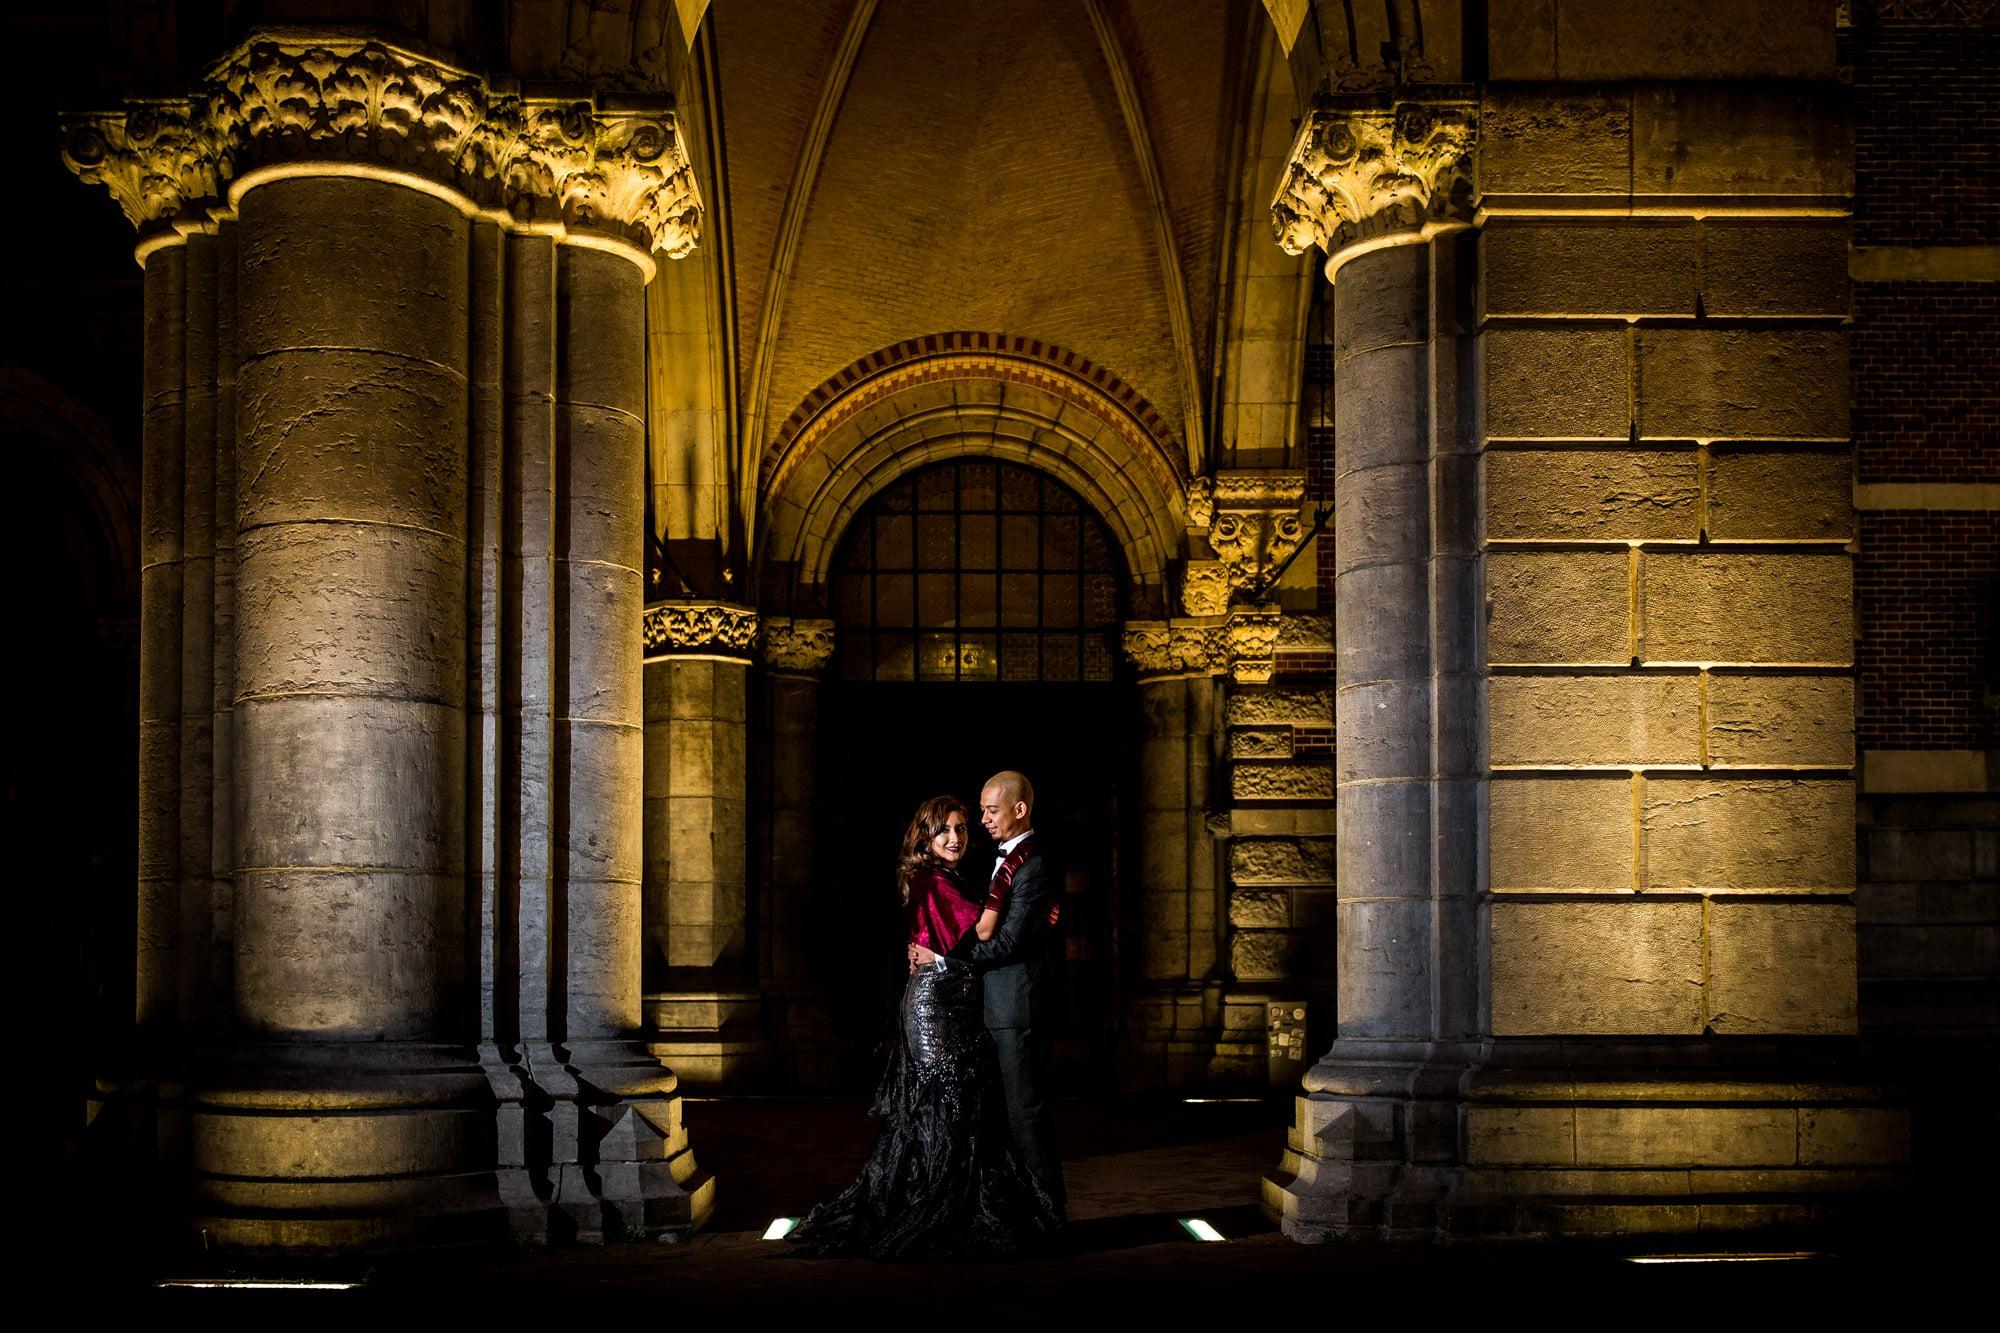 After Wedding Photoshoot Amsterdam - 11.jpg